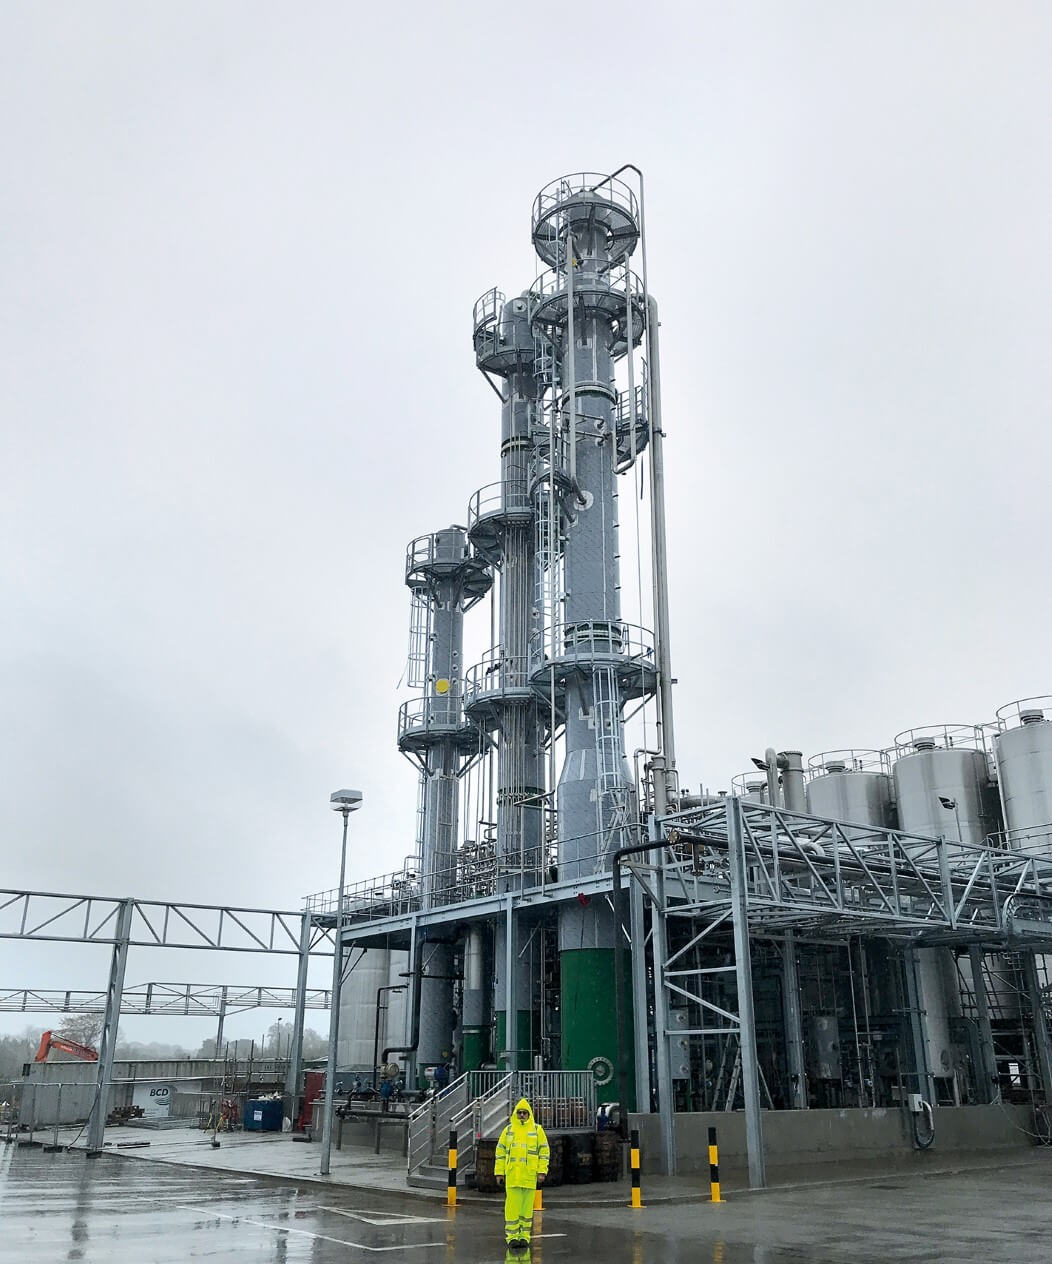 The new grain distillery